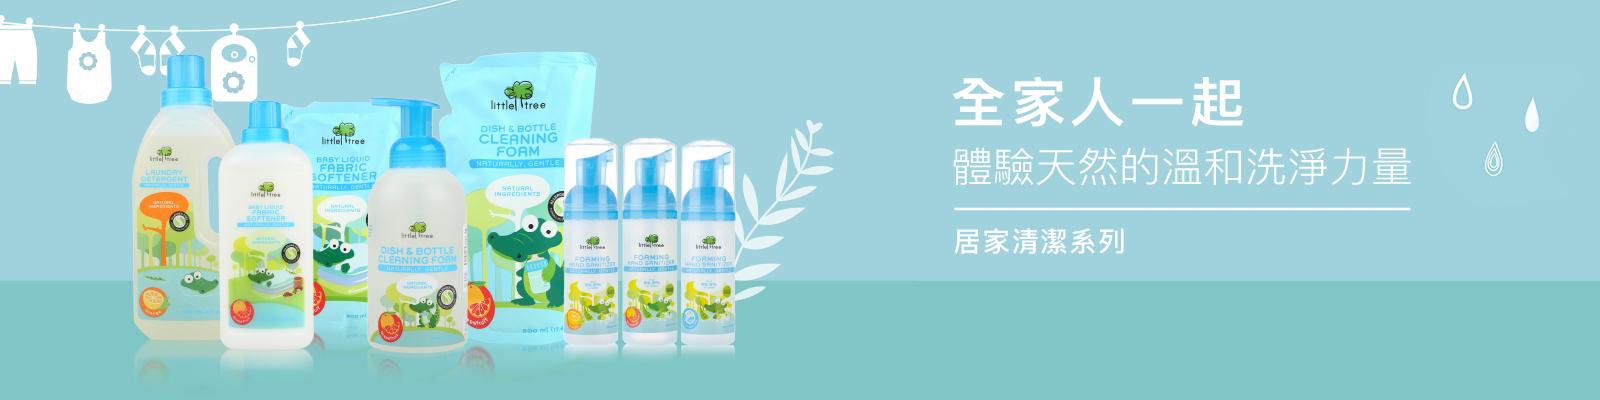 Desktop Banner for 居家清潔系列-英國小樹苗Little Tree | 沐伊孕哺MOOIMOM 全球孕婦用品領導品牌推薦